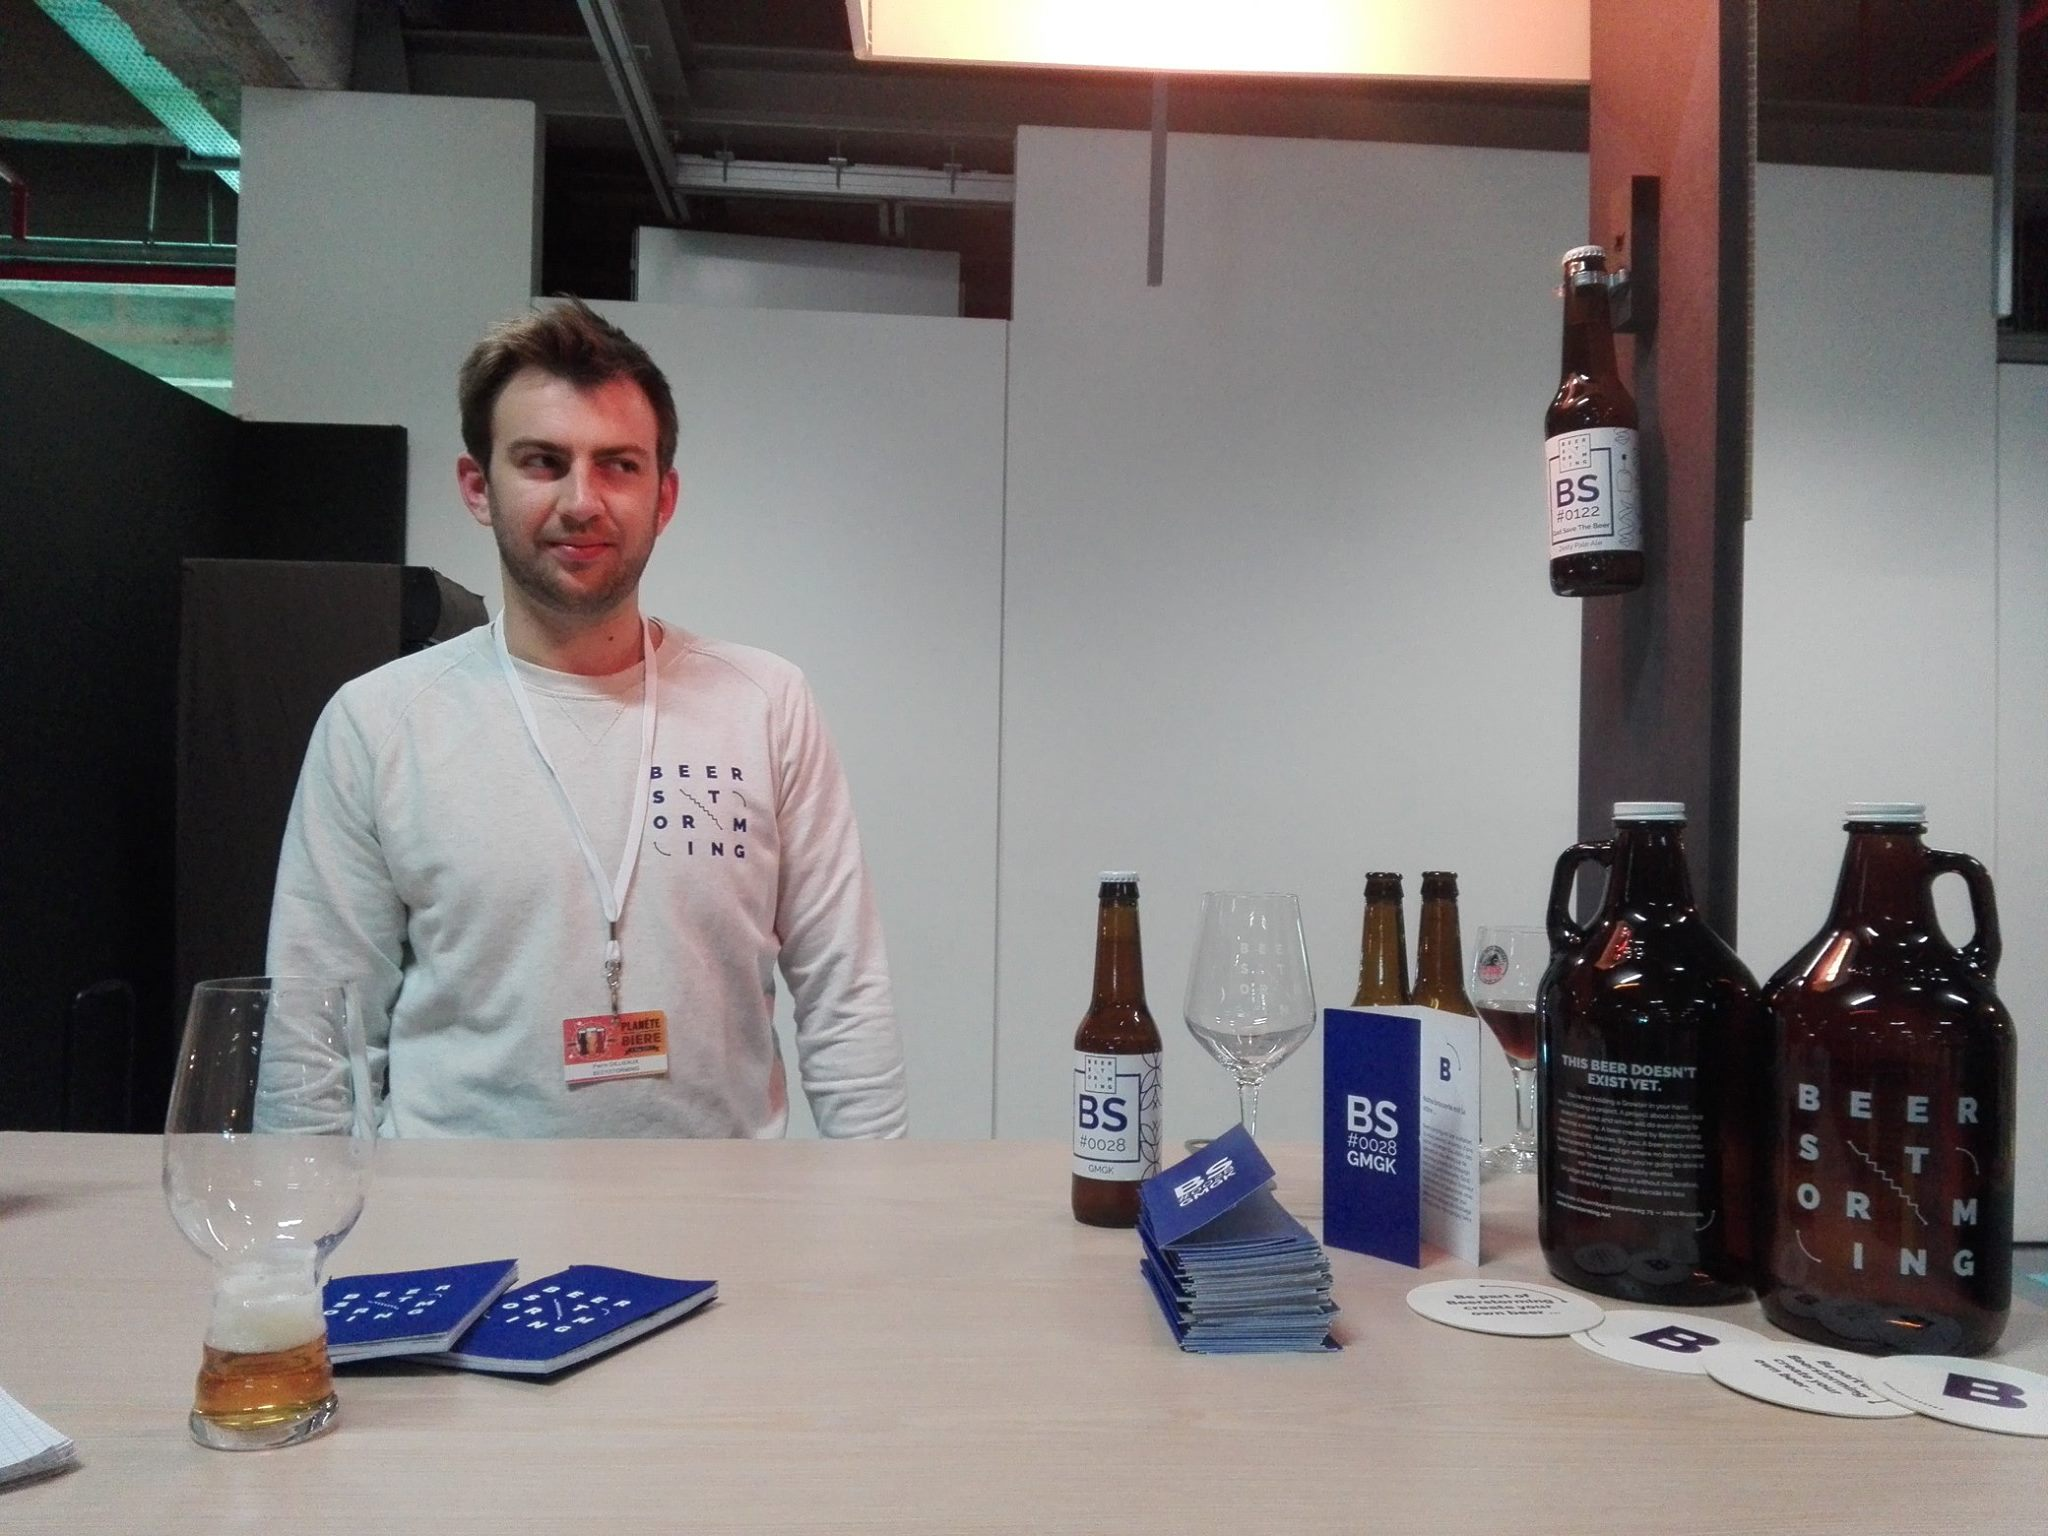 Brasserie Beerstorming - Planète Bière 2018